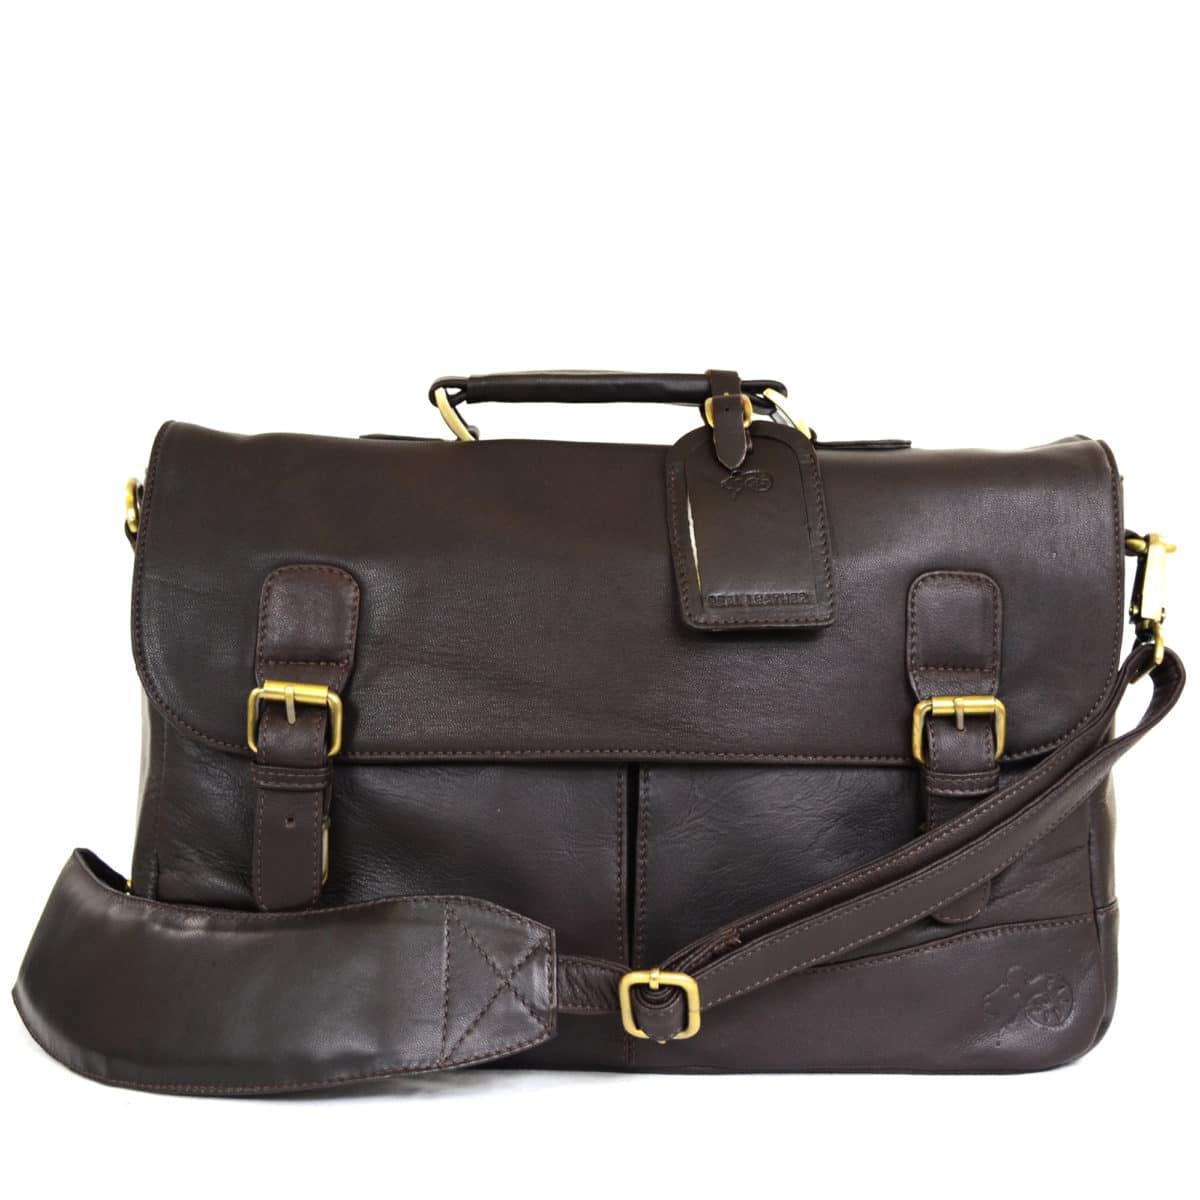 Men's Leather Satchel Bag - Brown